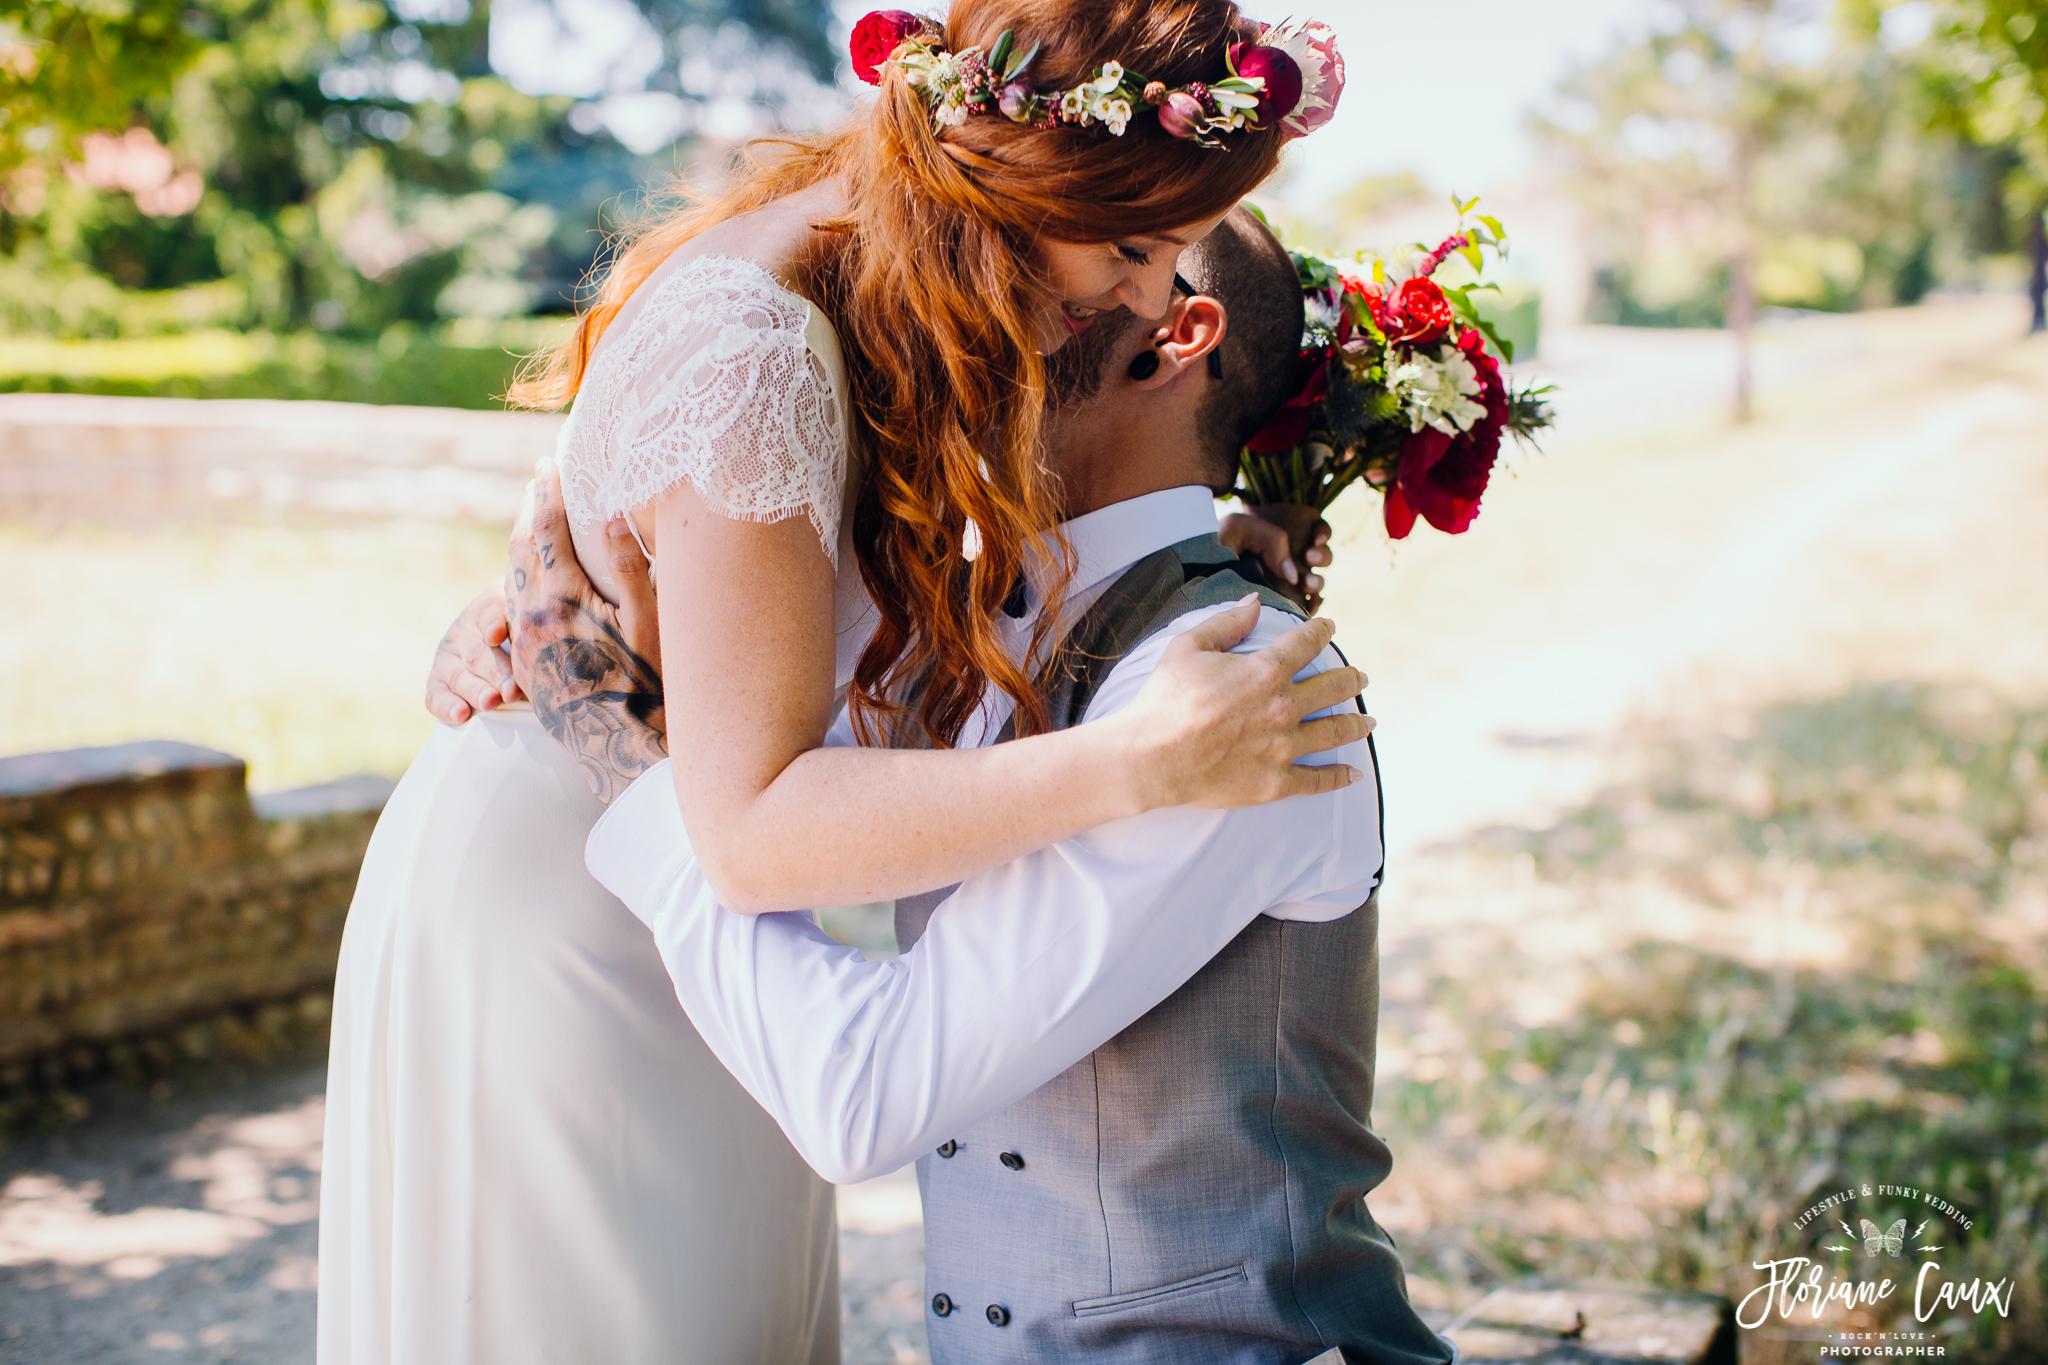 photographe-mariage-toulouse-rocknroll-maries-tatoues-floriane-caux-19